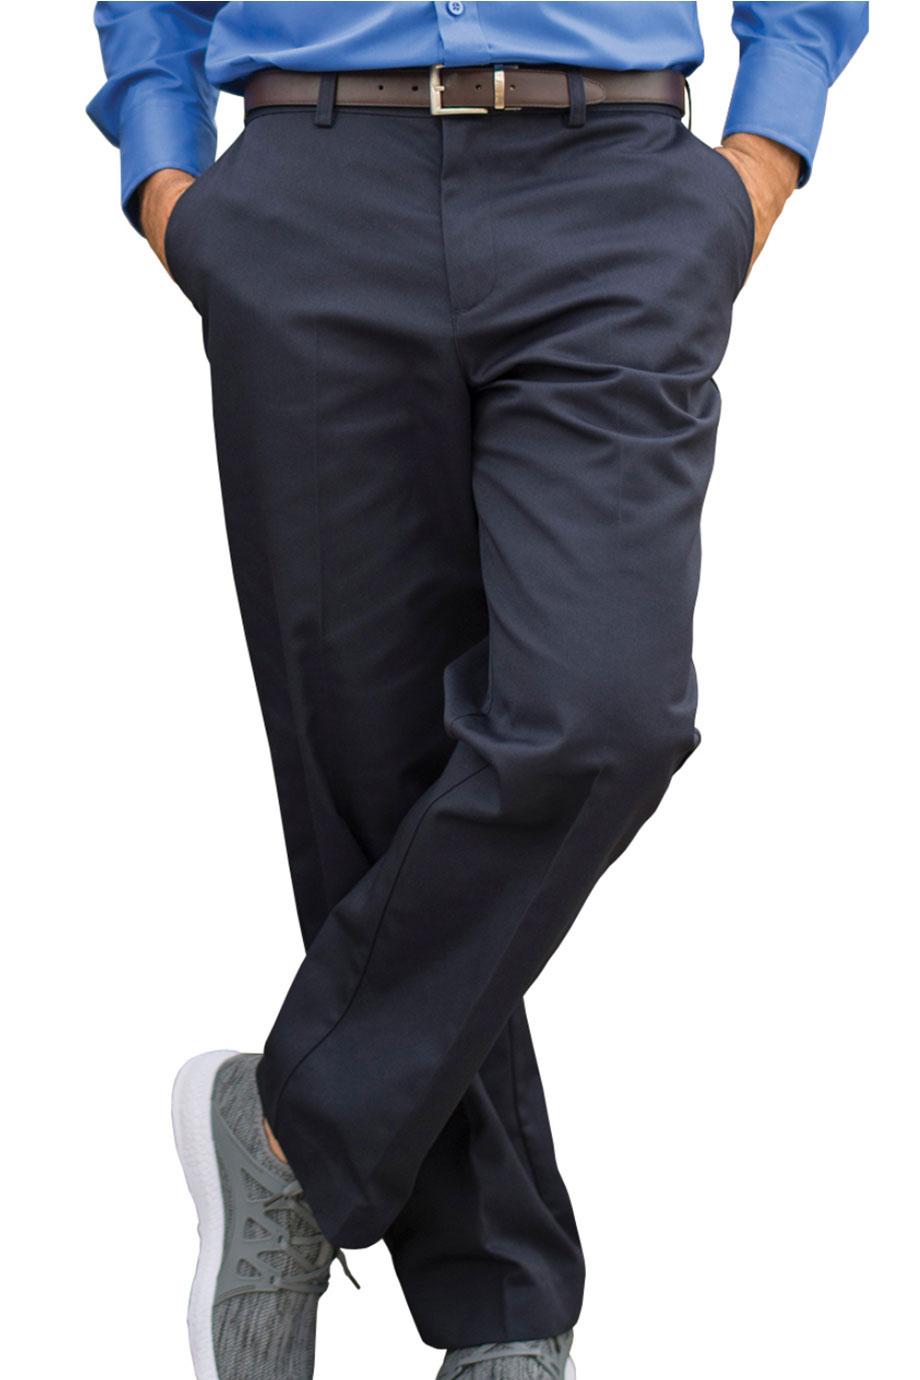 UTILITY CHINO FLAT FRONT PANT